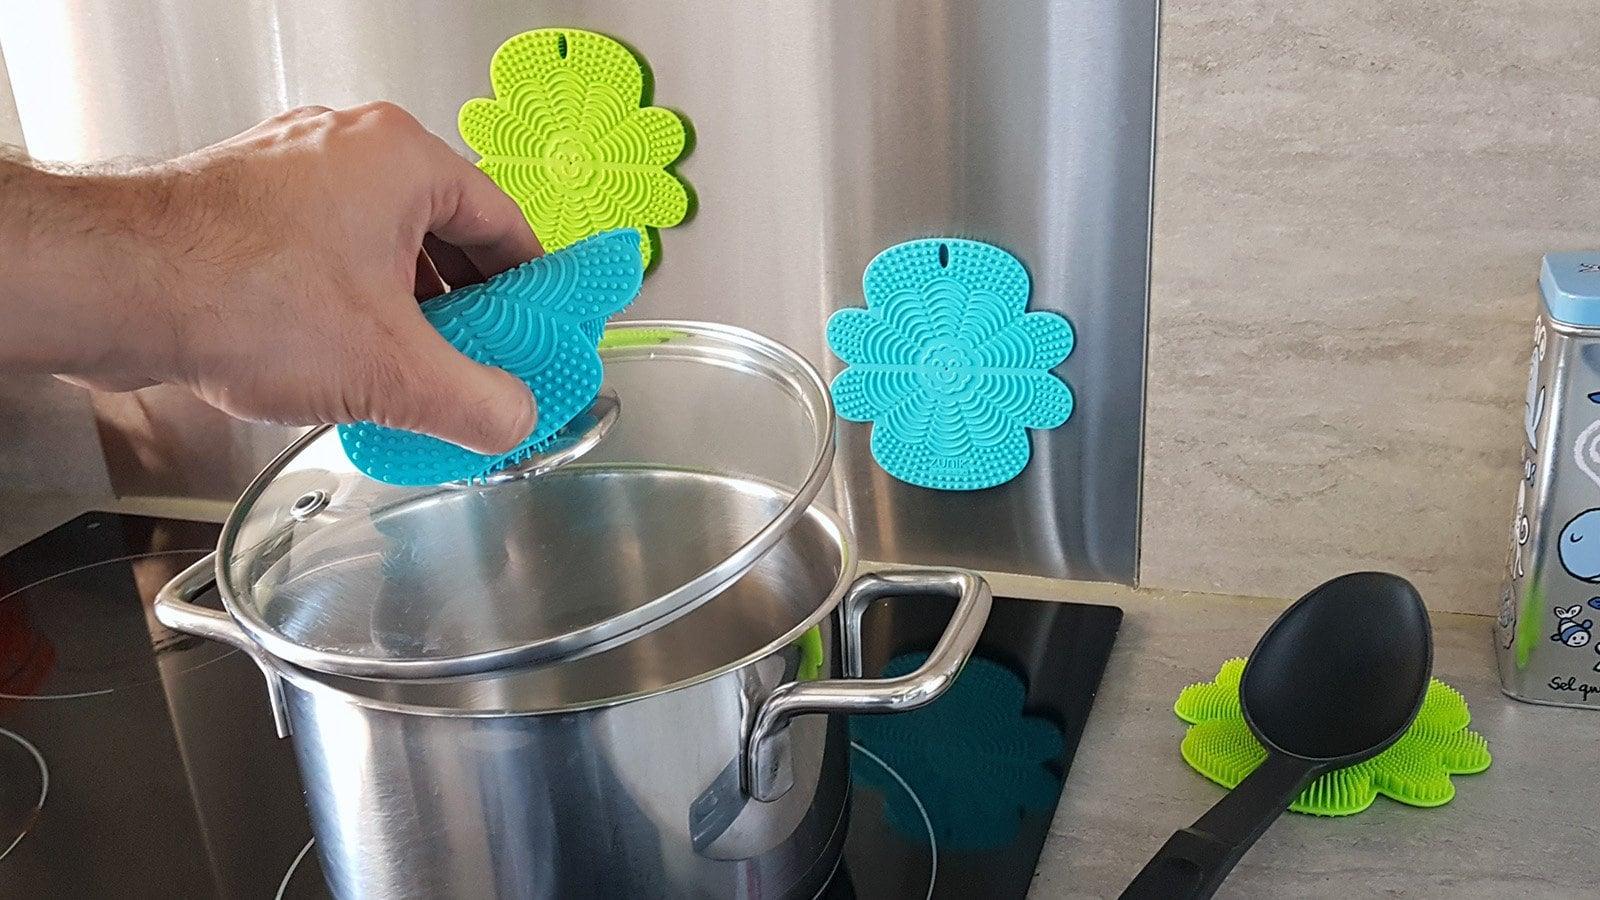 Scrubbio Multifunctional Magnetic Silicone Brush